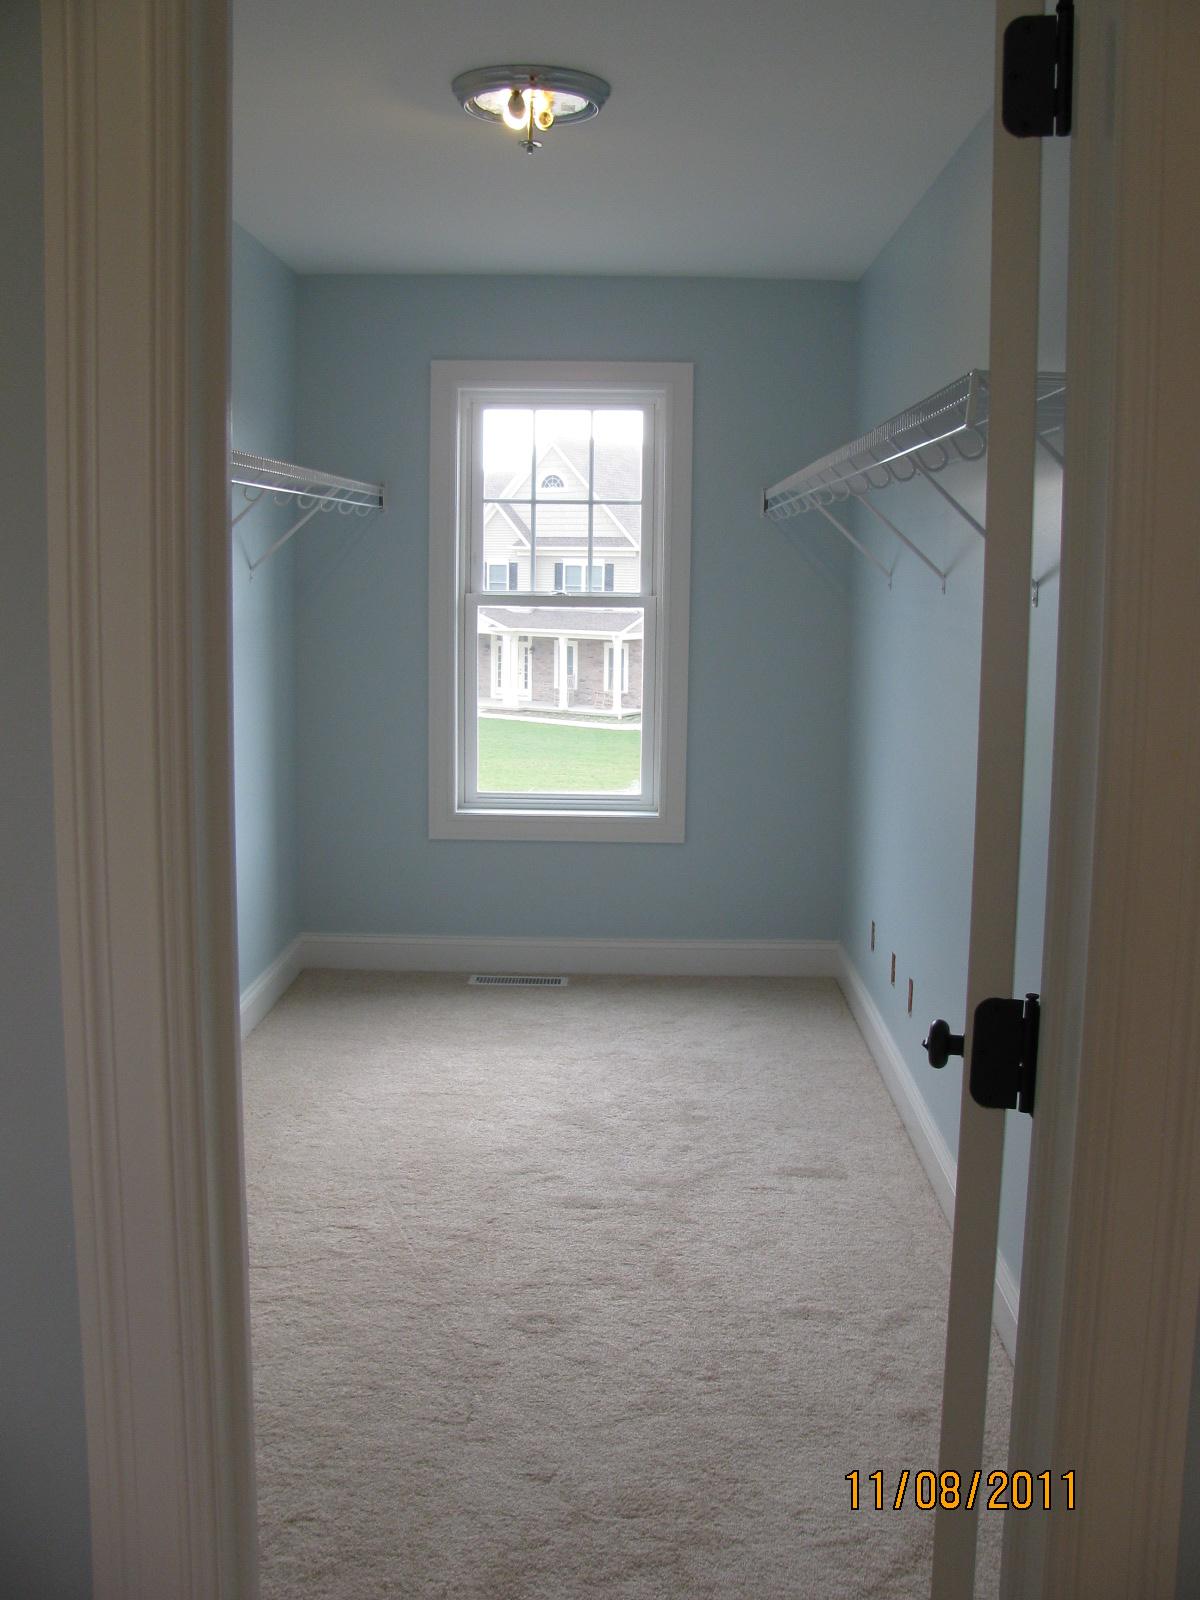 Smokey Blue Bedroom: Nit's News: Done